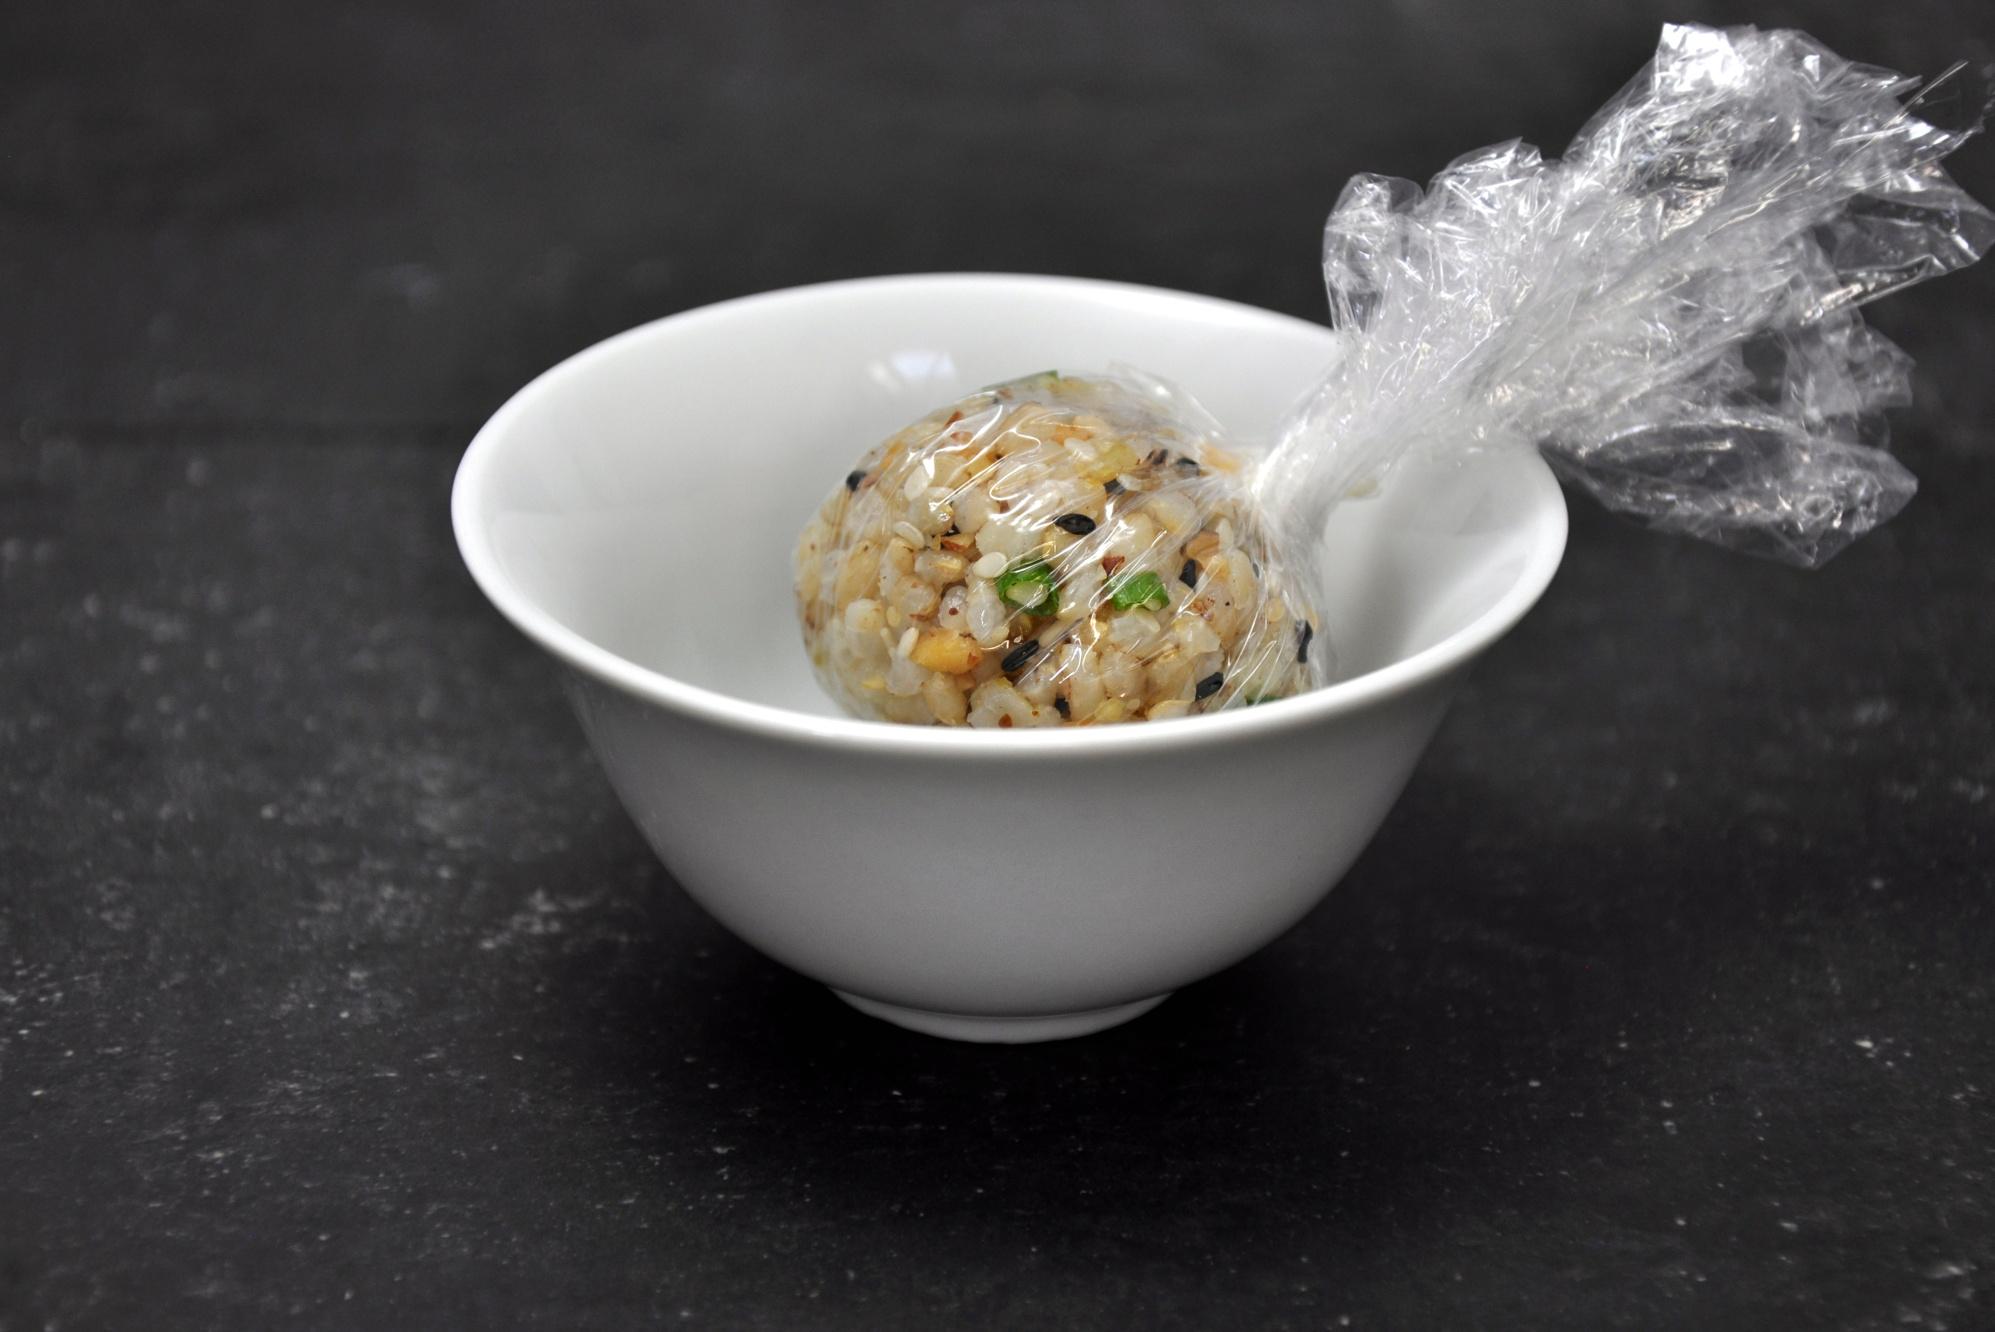 rice balls arancini di riso rice balls rice balls stuffed rice balls ...